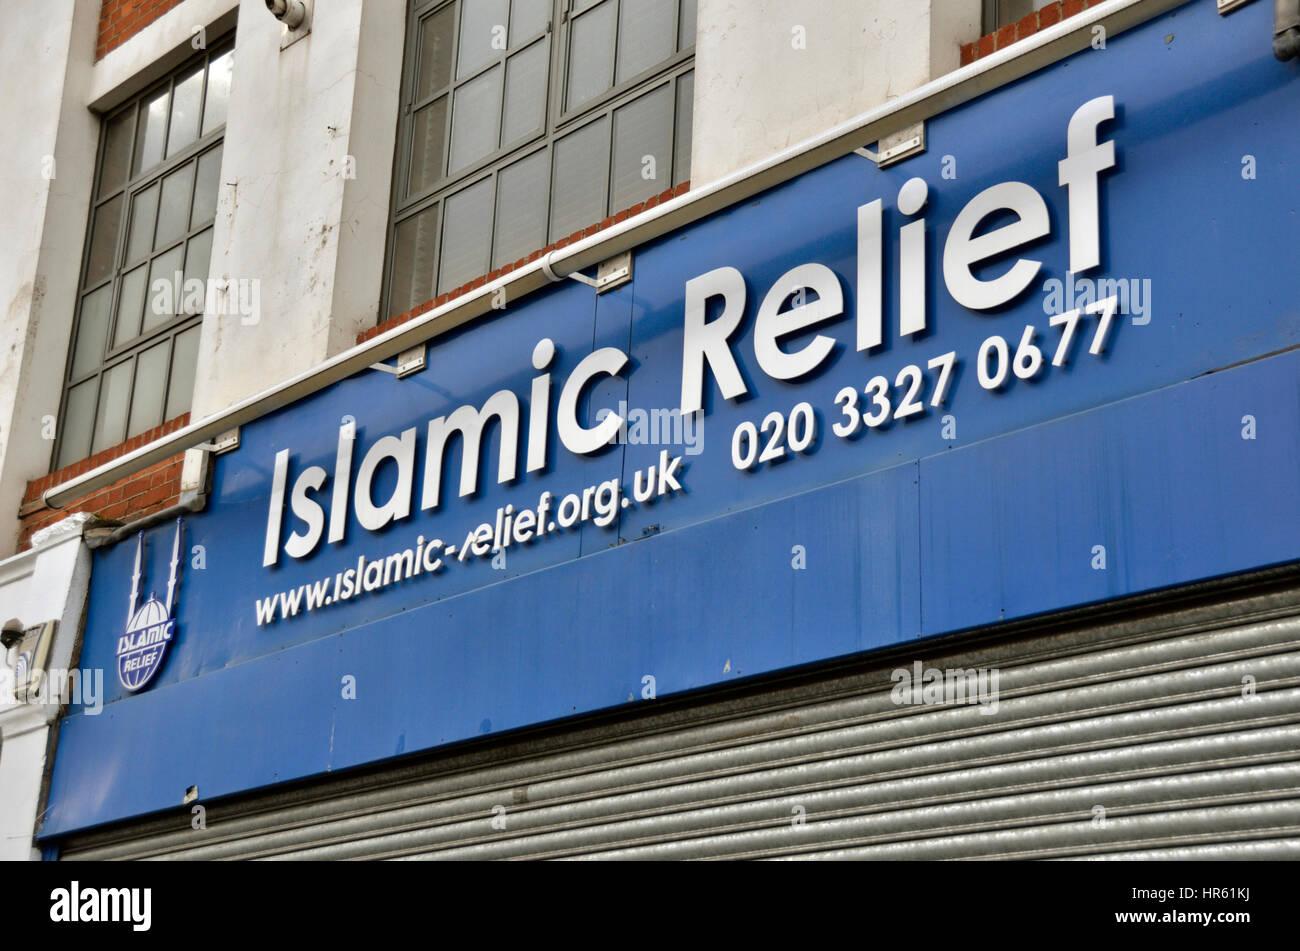 Islamic Relief Worldwide - Faith inspired action